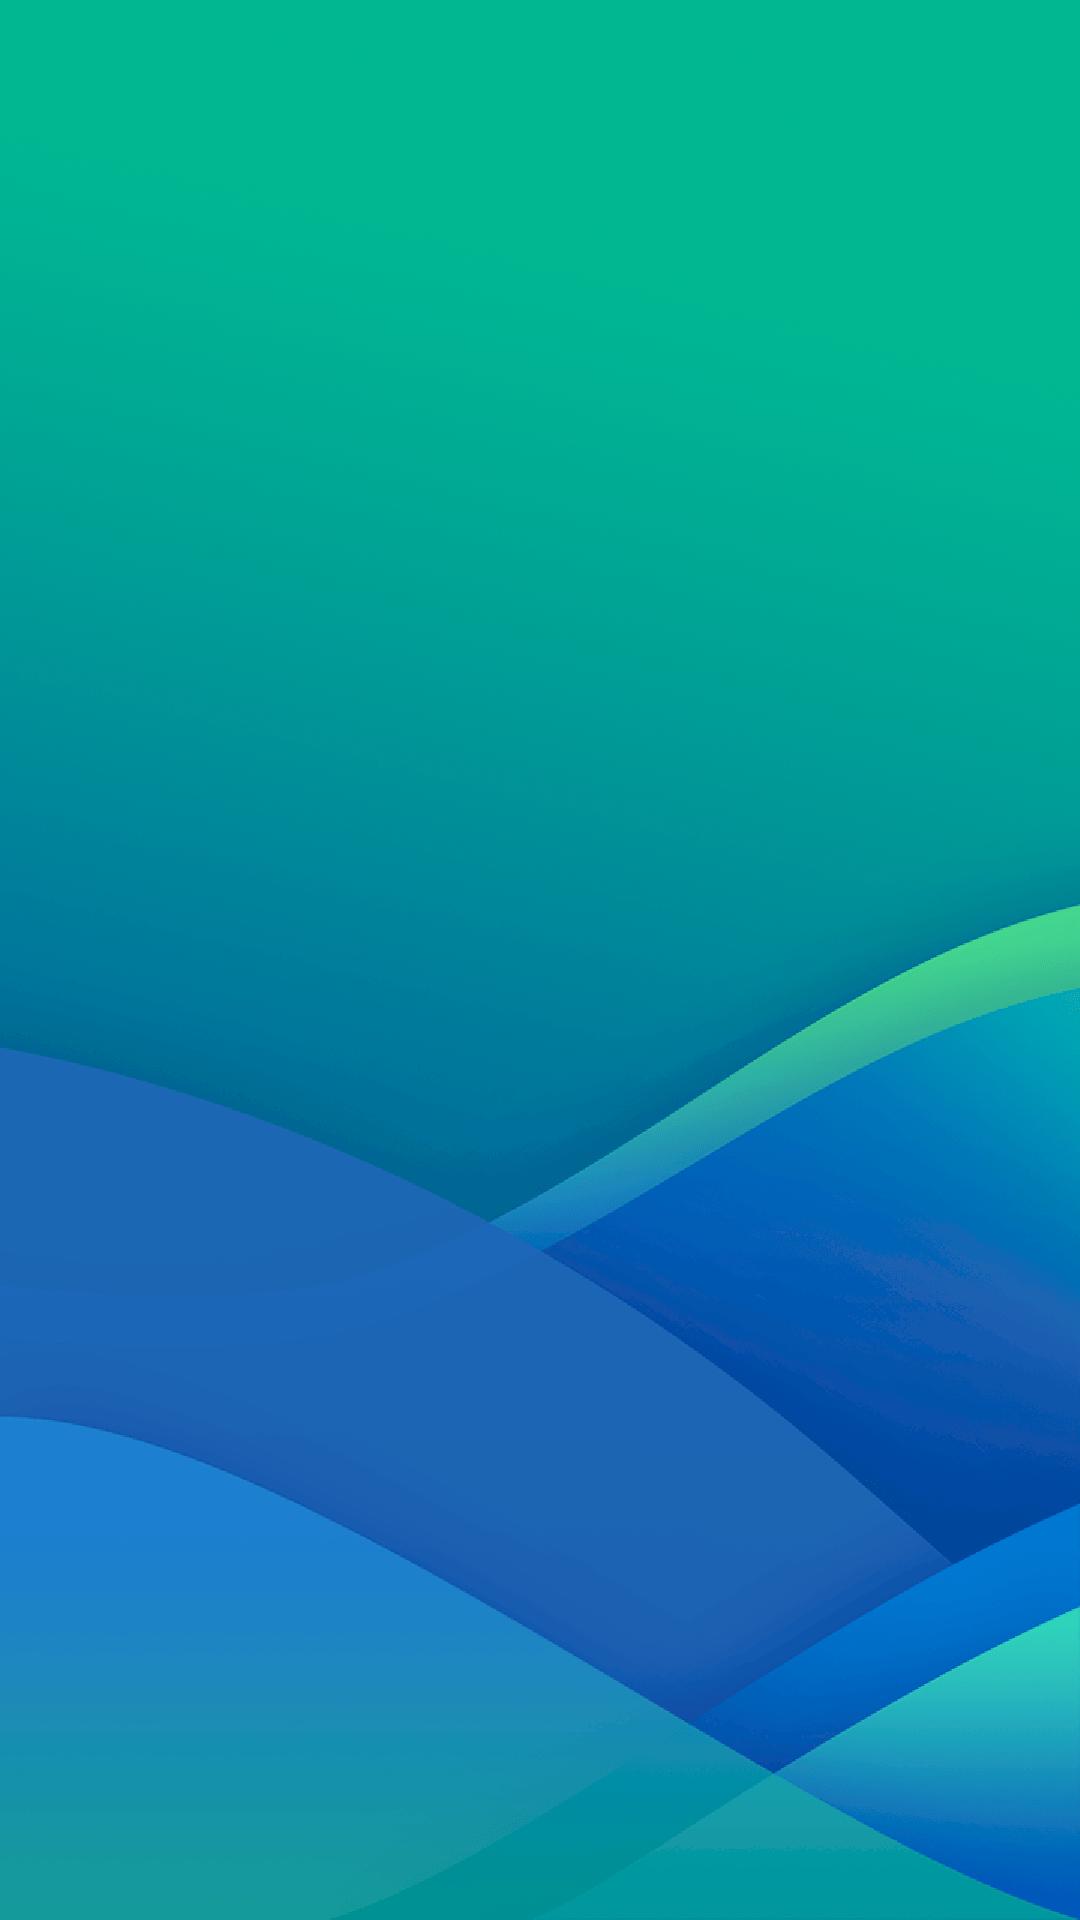 28+ Gionee Wallpaper Hd Download